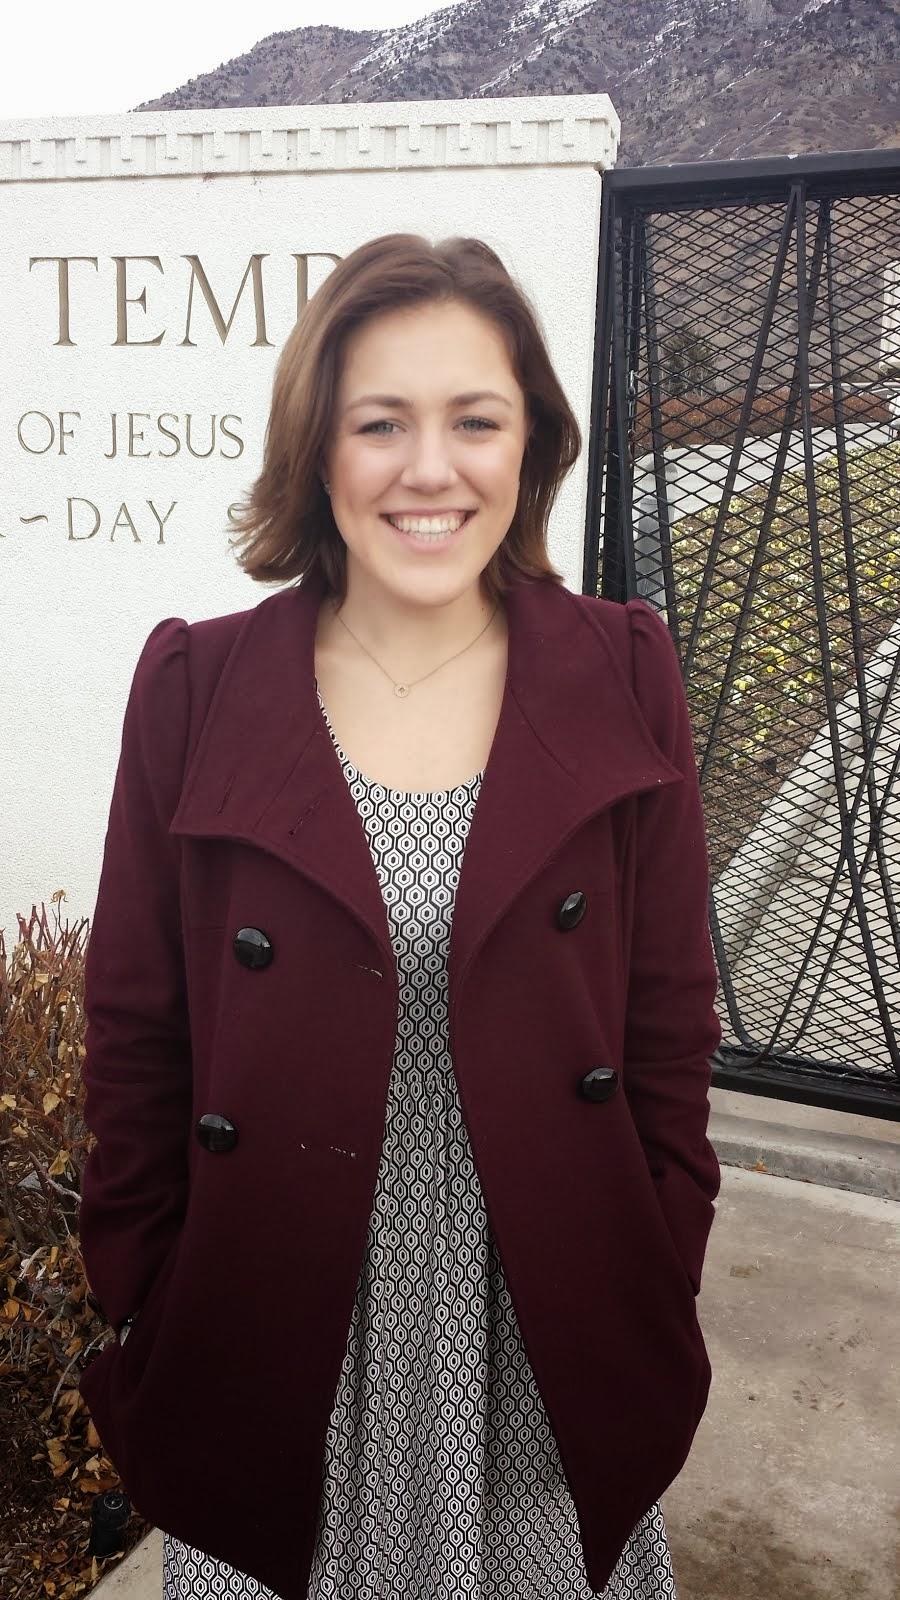 Sister Blanchard